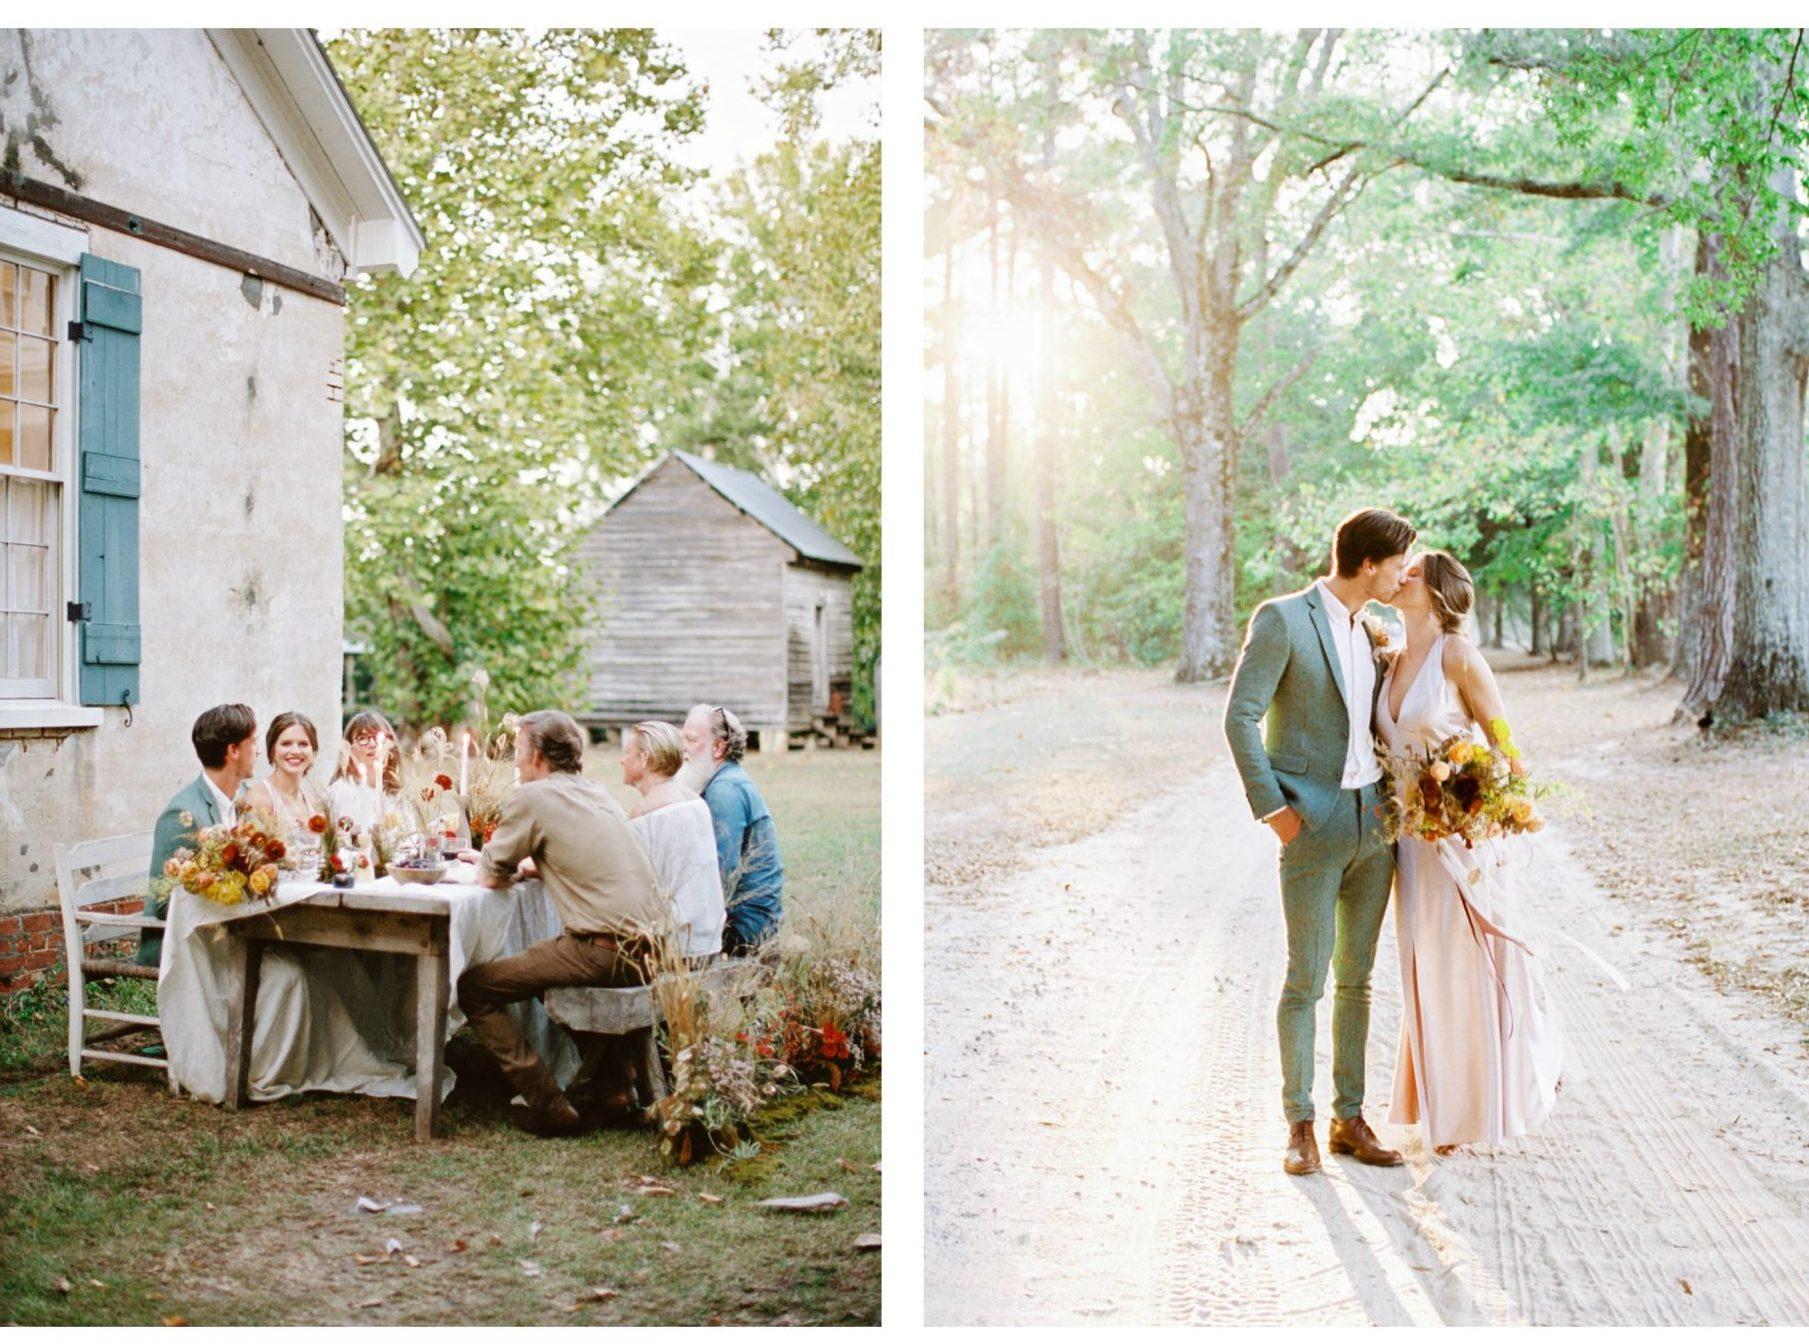 Fall Elopement Wedding at South Carolinas Wavering Place